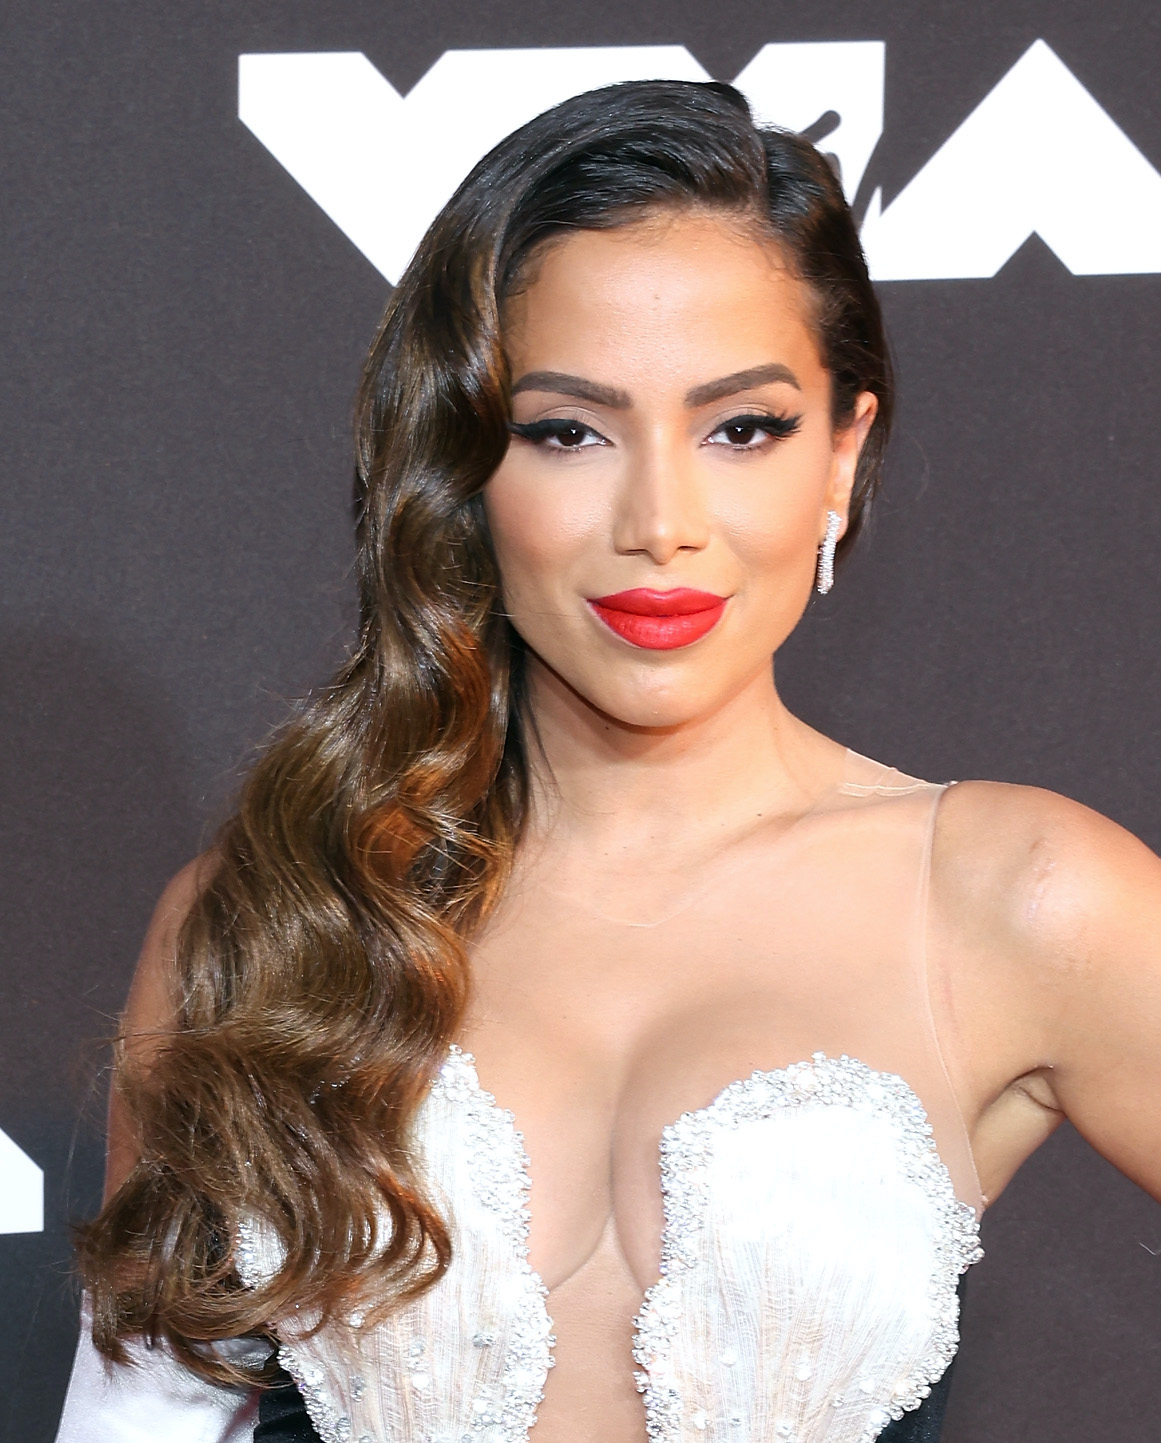 MTV VMA looks del belleza, Anitta